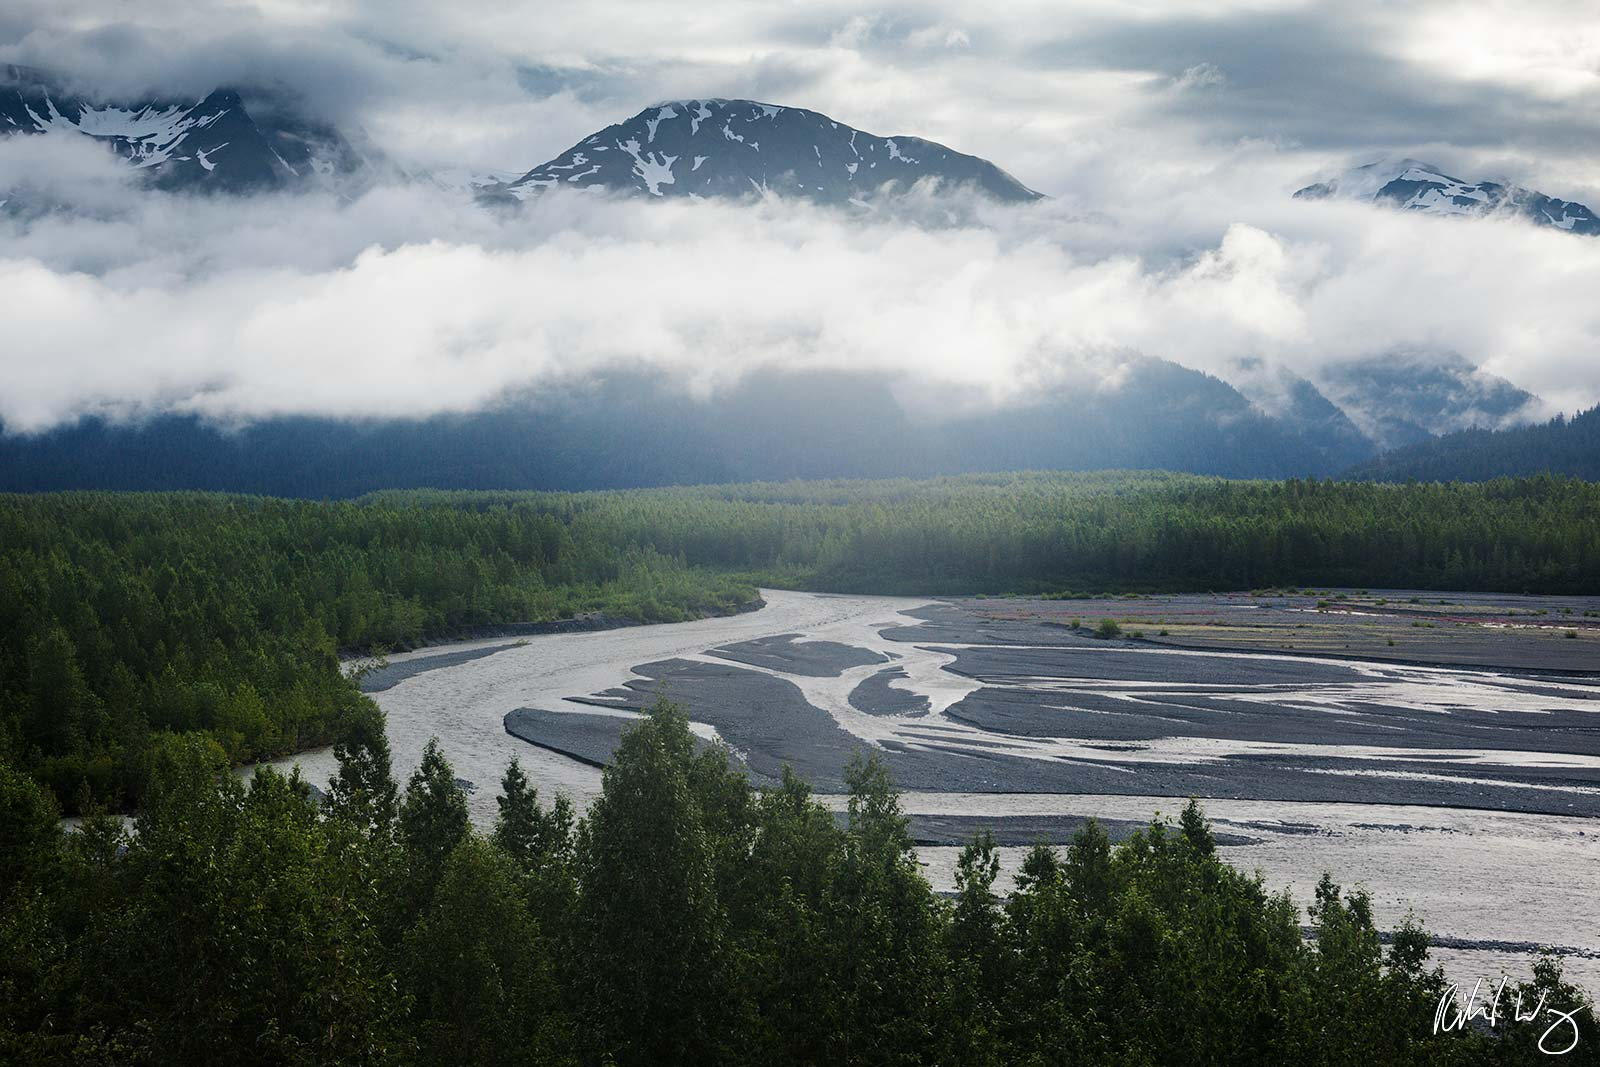 Resurrection River Scenic Vista From Exit Glacier Trail, Kenai Fjords National Park, Alaska, photo